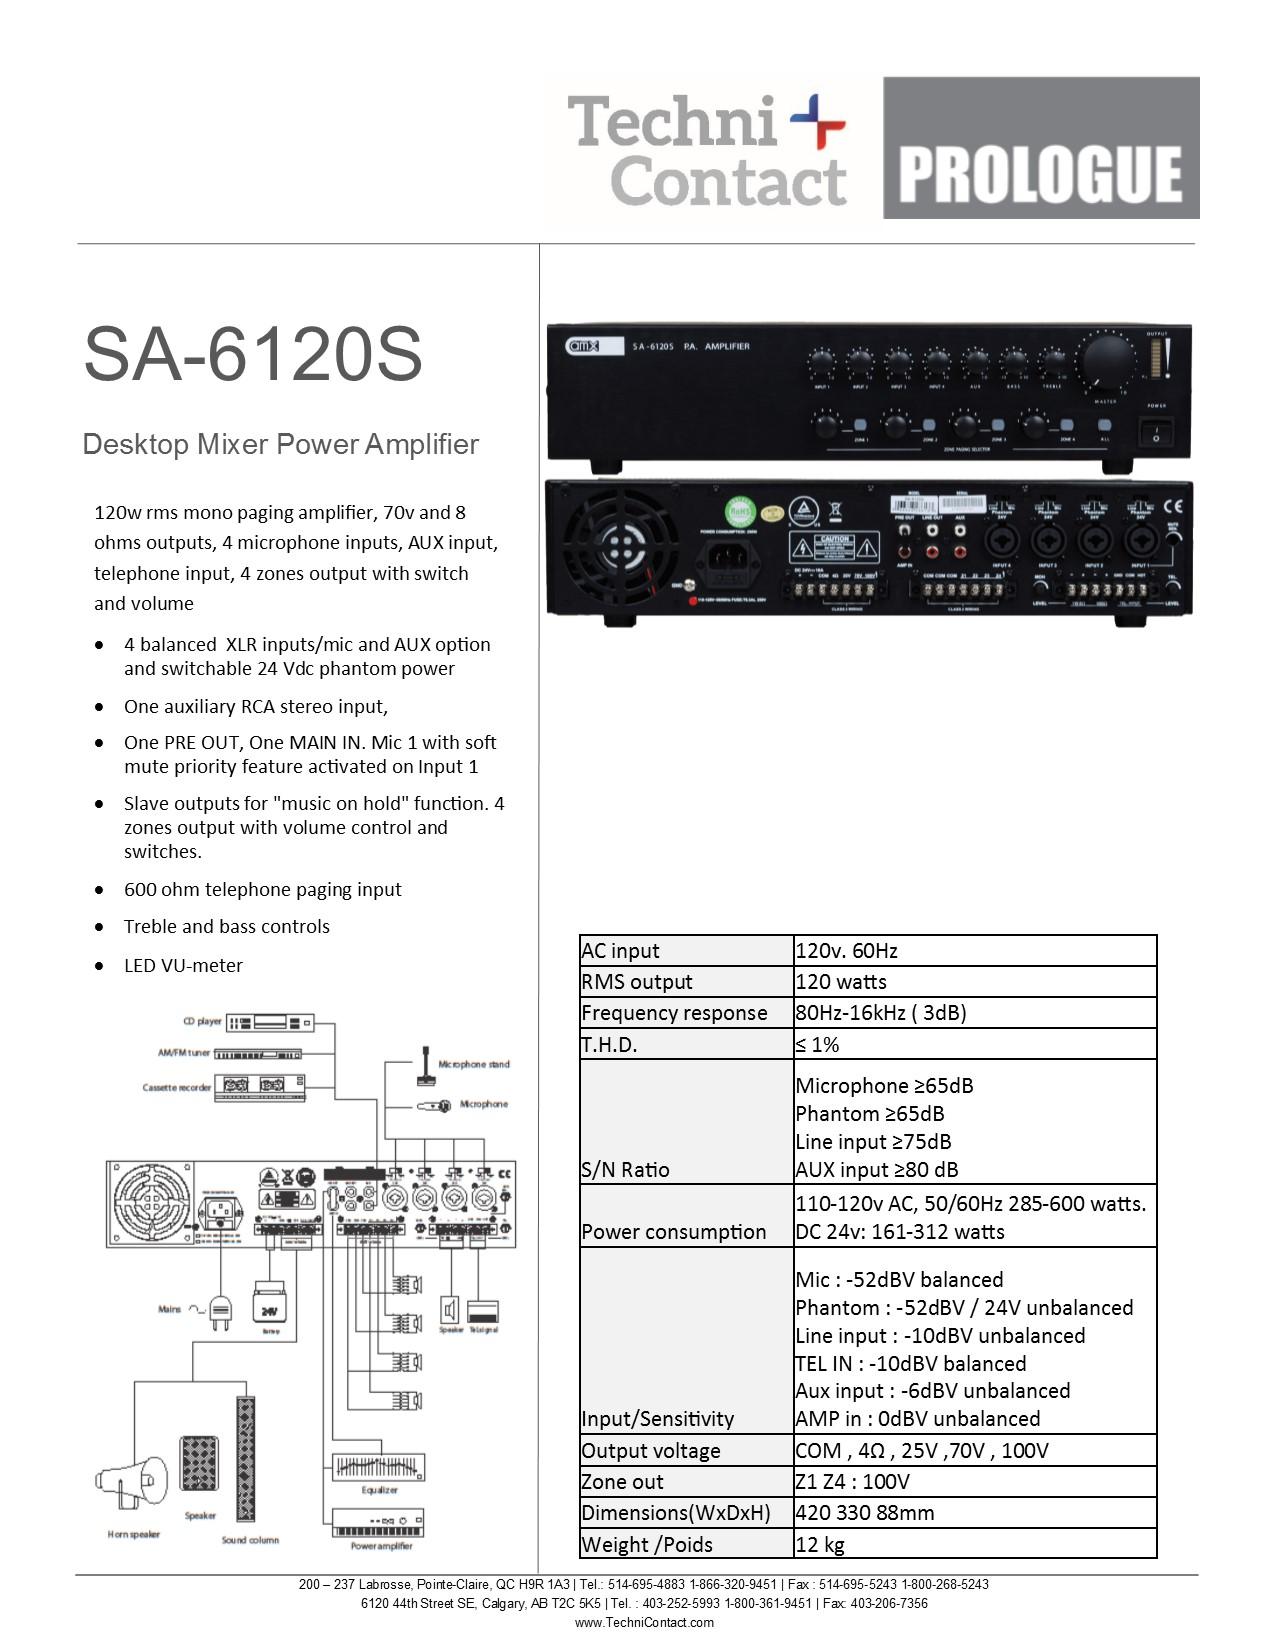 Prologue_SA-6120S_SPECS.jpg